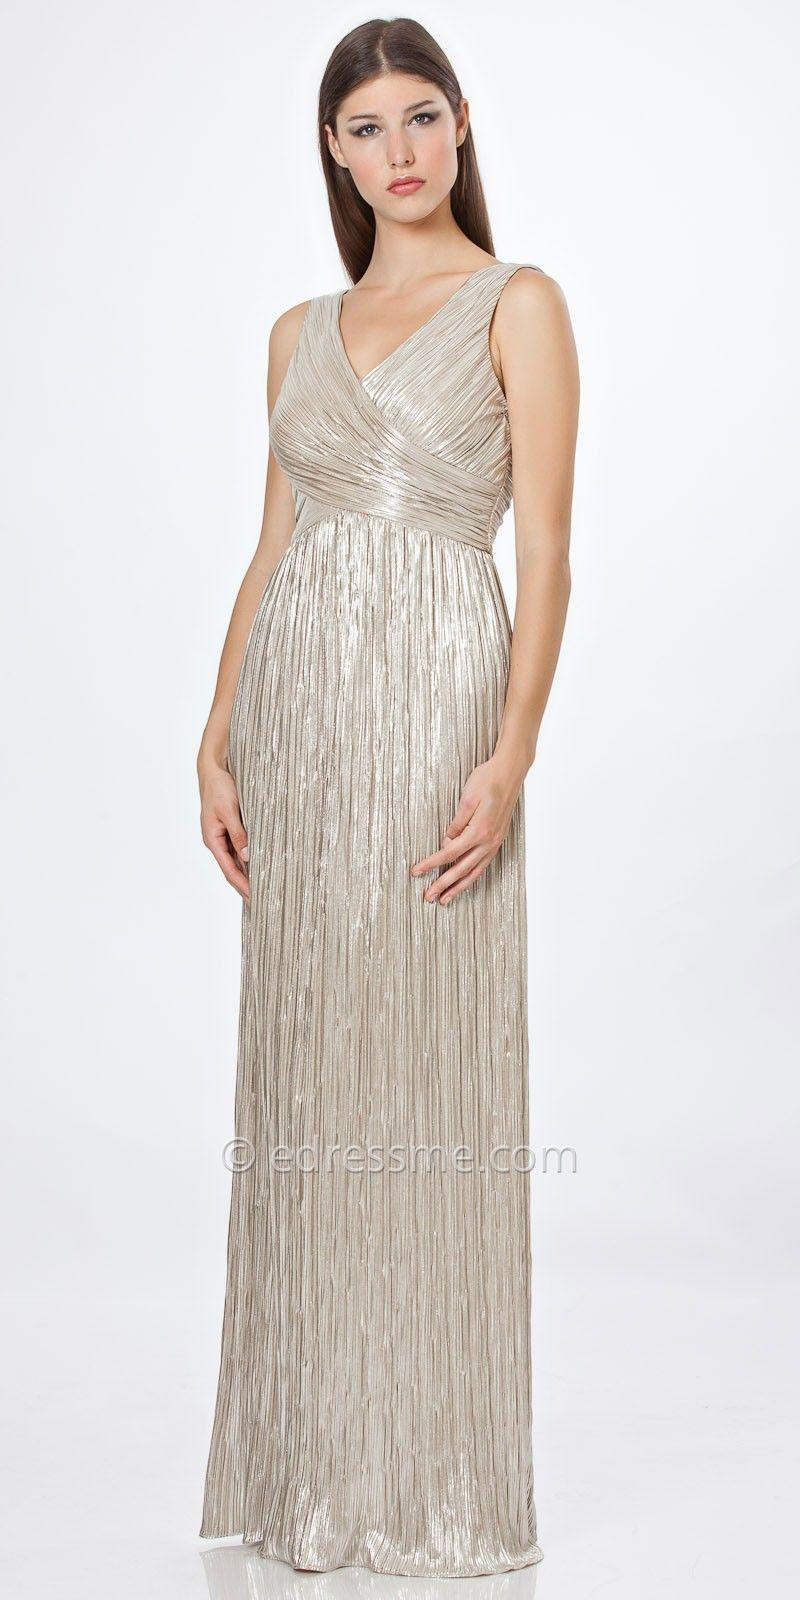 JS Boutique Metallic Knit Dress